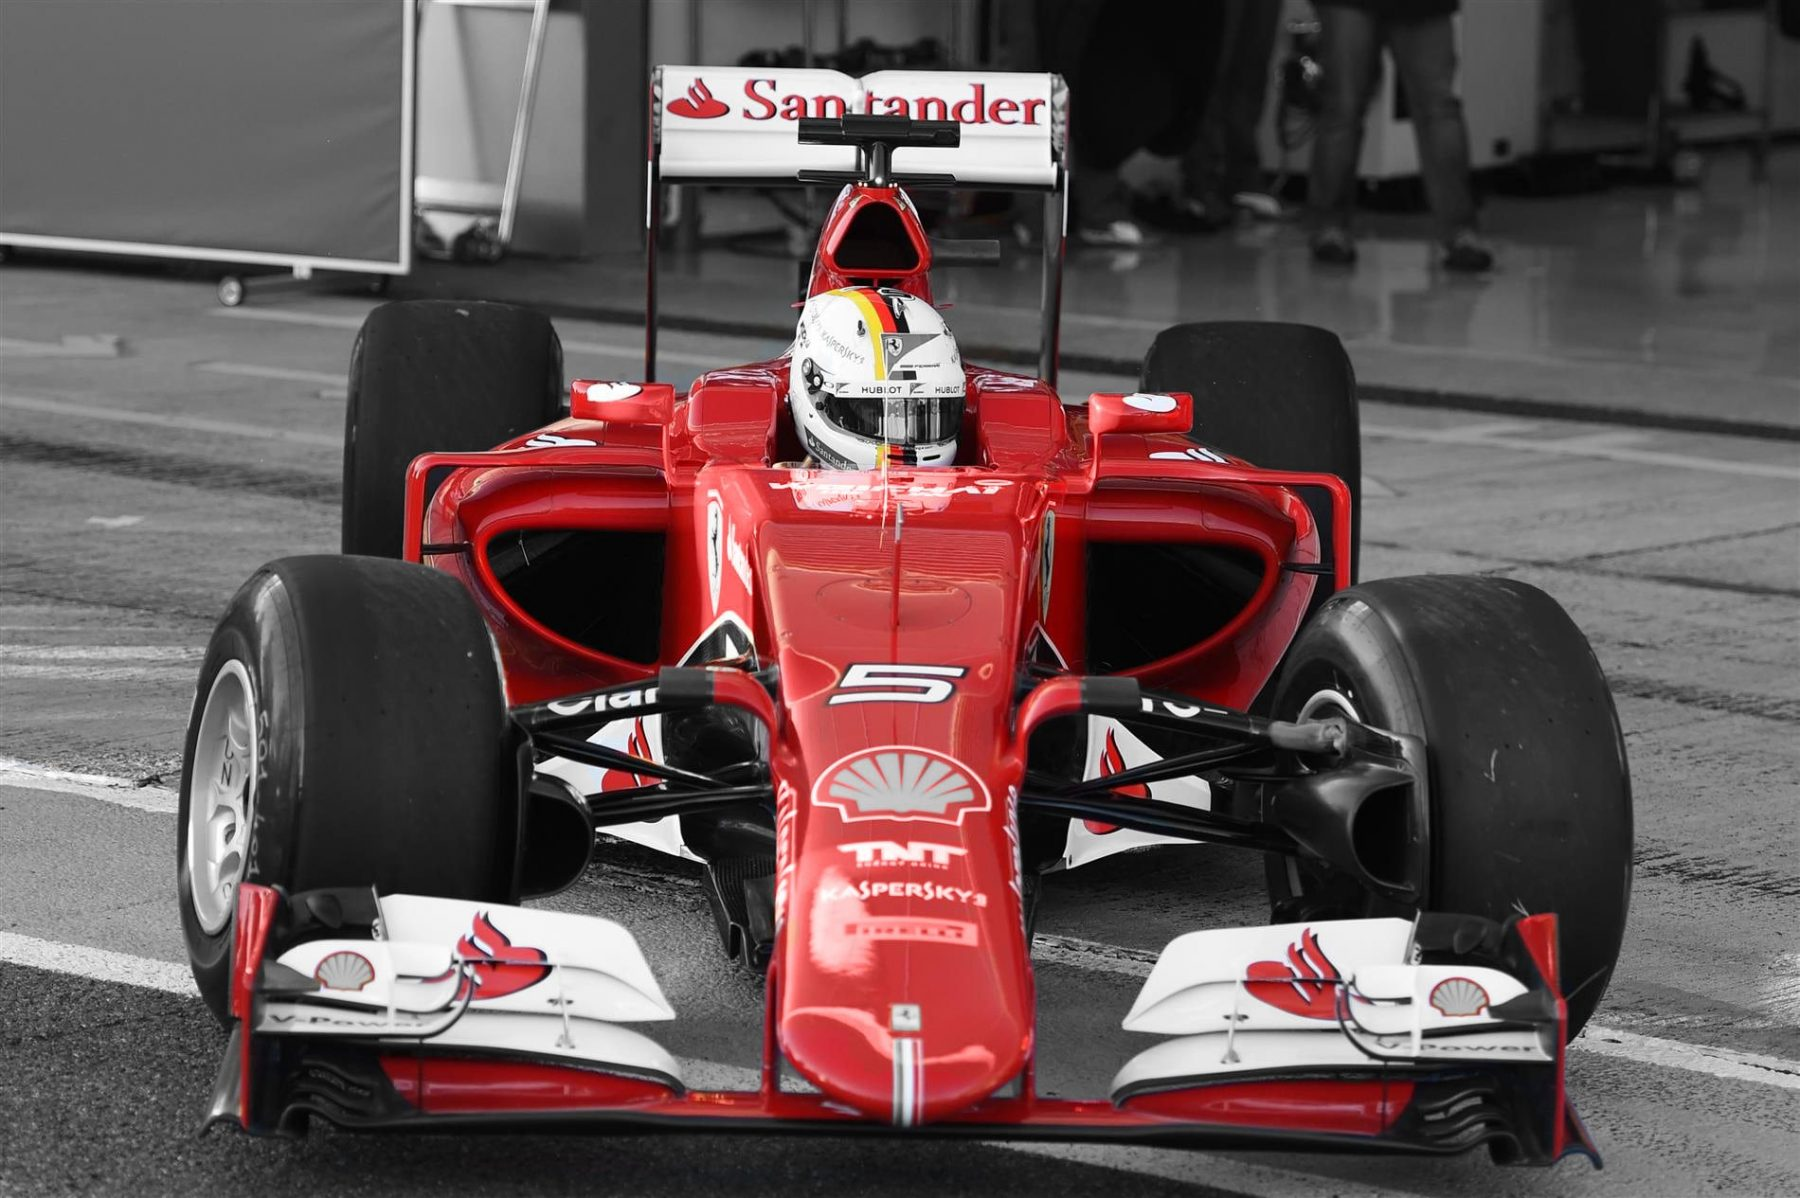 Sebastian Vettel Hd Wallpapers 7wallpapers Net